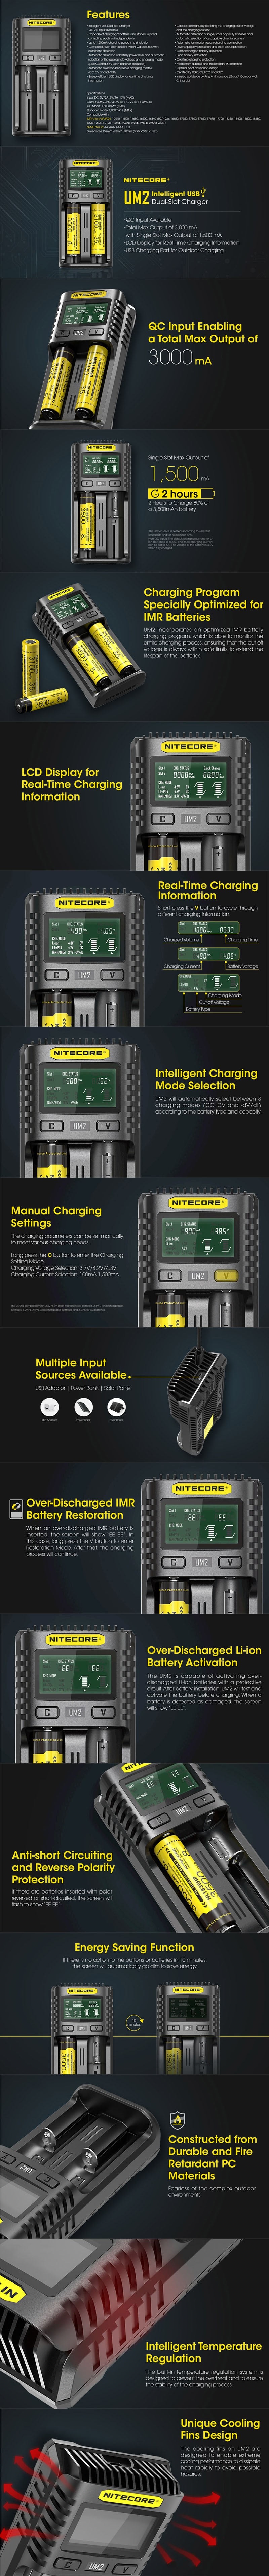 Nitecore UM2 USB Charger for 10440, 14500, 14650, 16500, 1634(RCR123), 18350, 18490, 18500, 18650 Battery